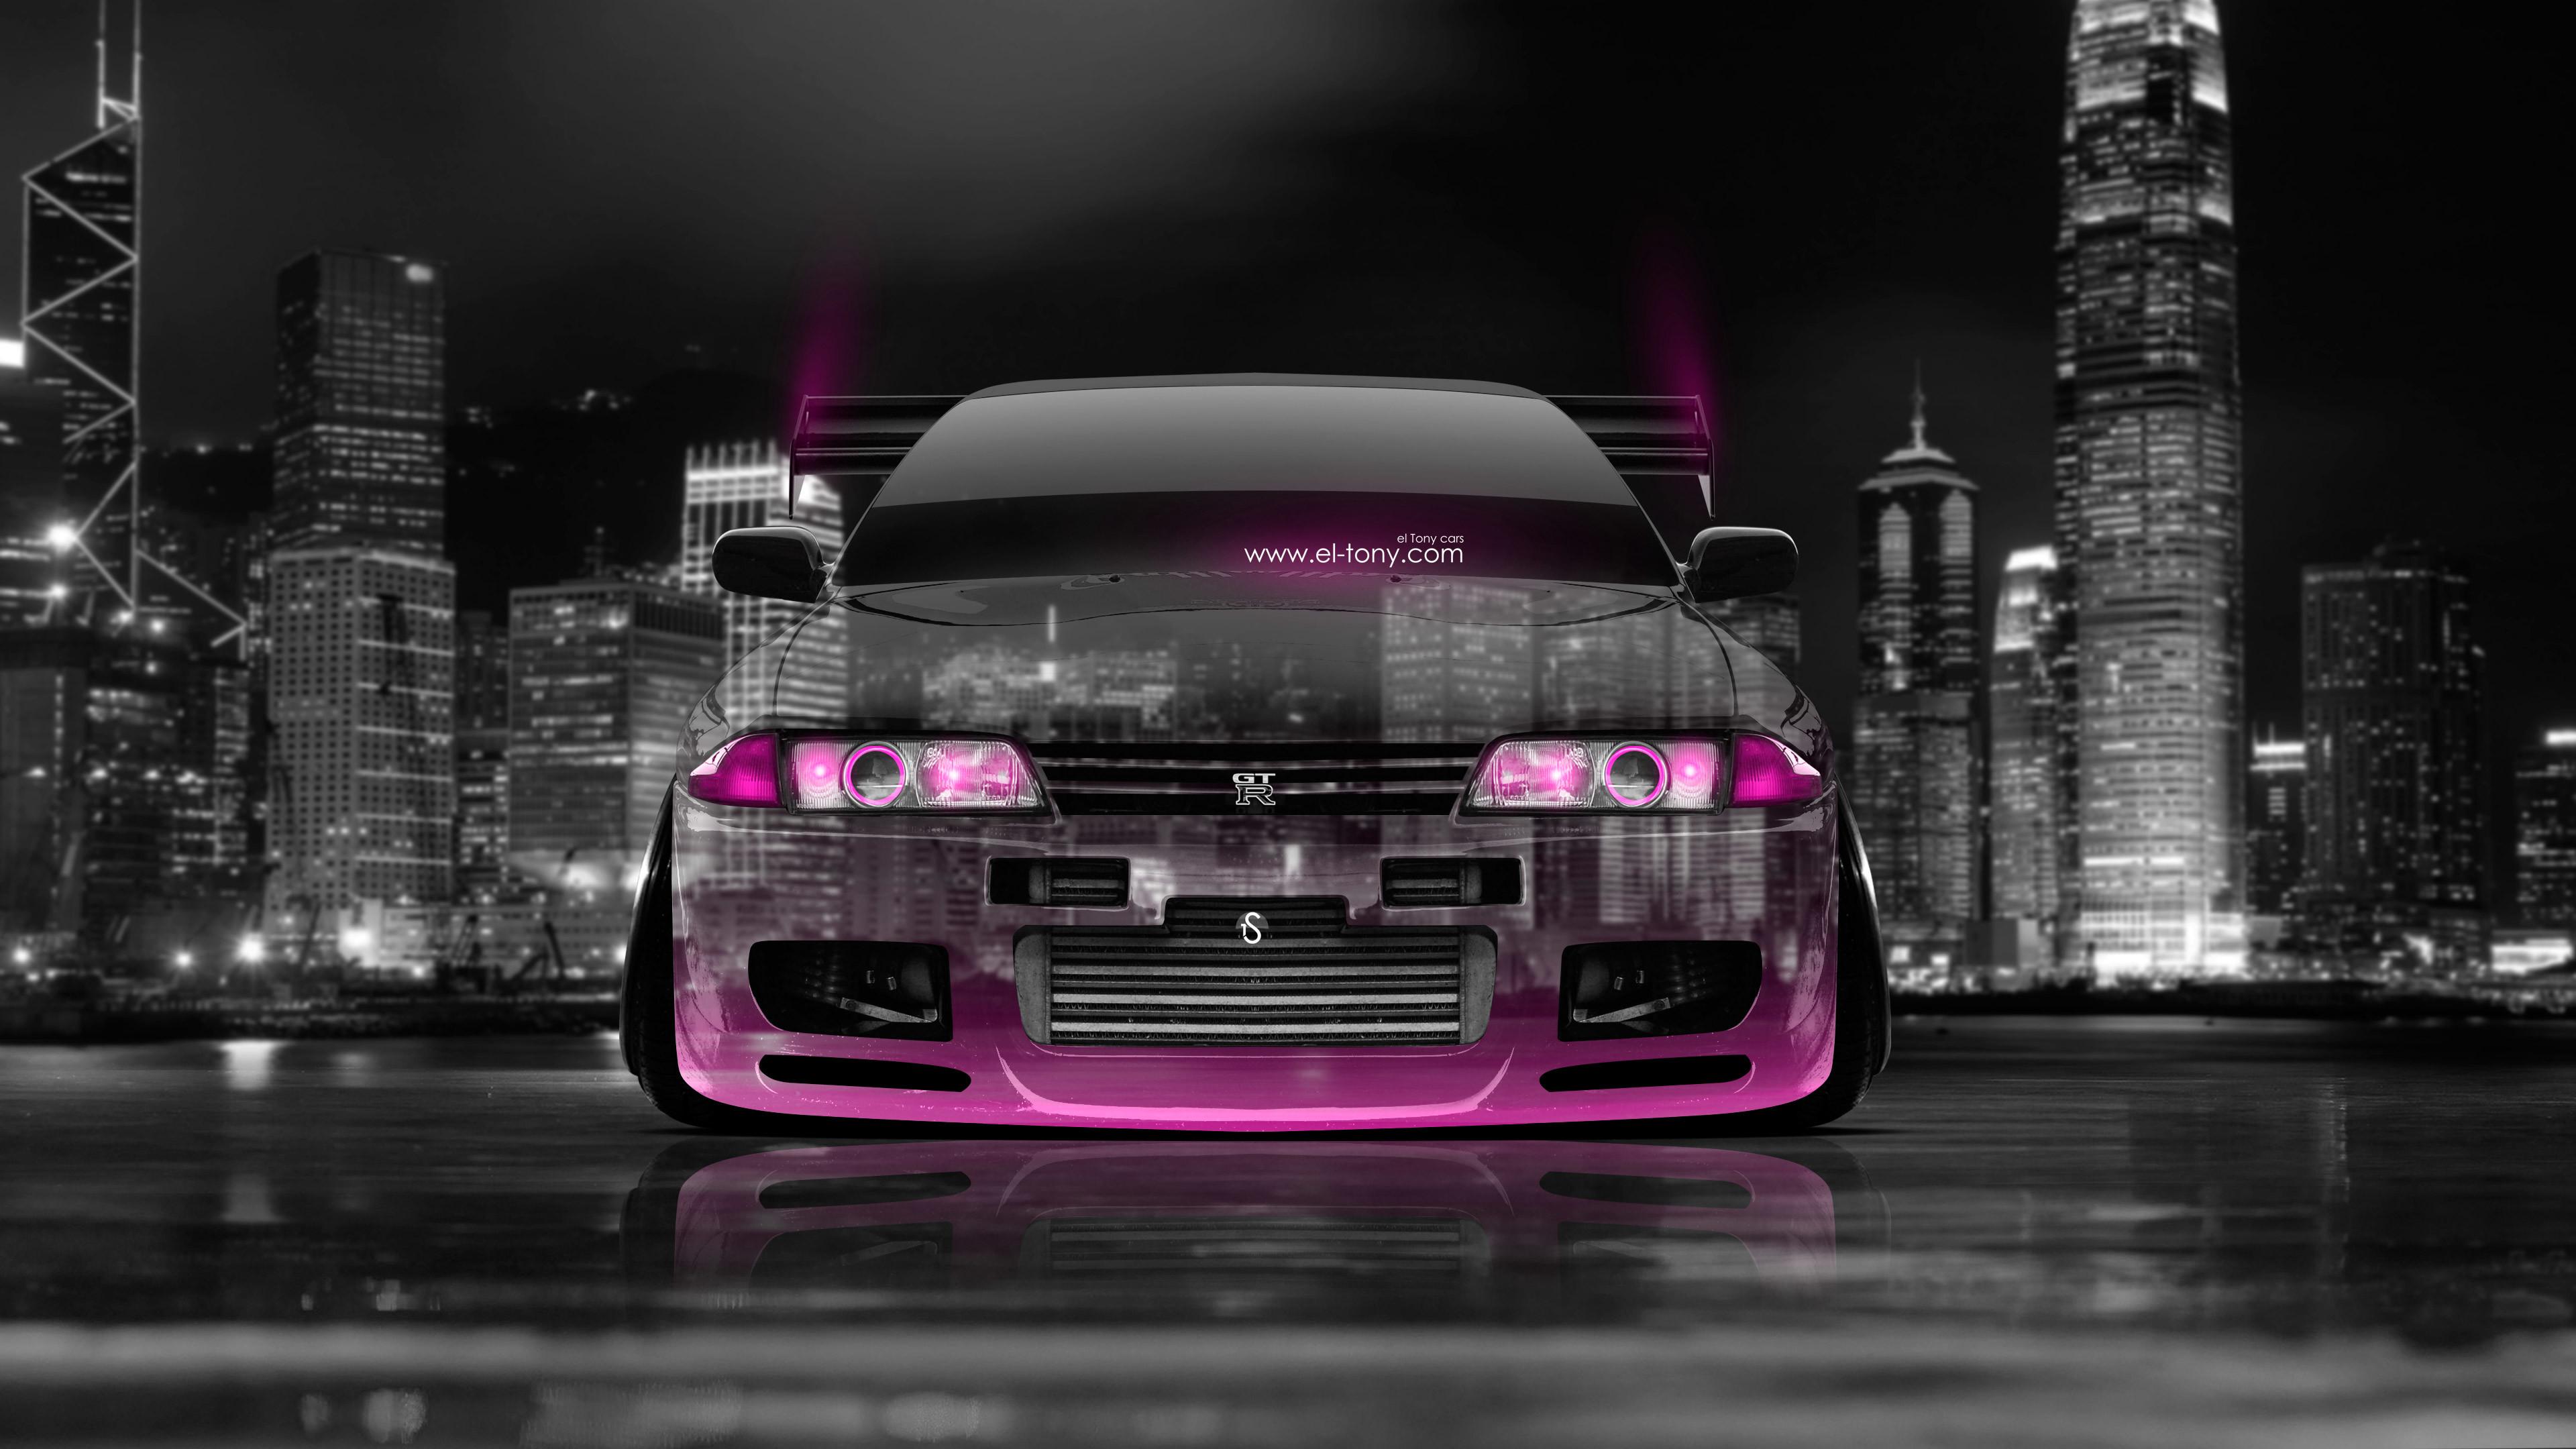 … Nissan-Skyline-GTR-R32-JDM-Front-Crystal-City- …